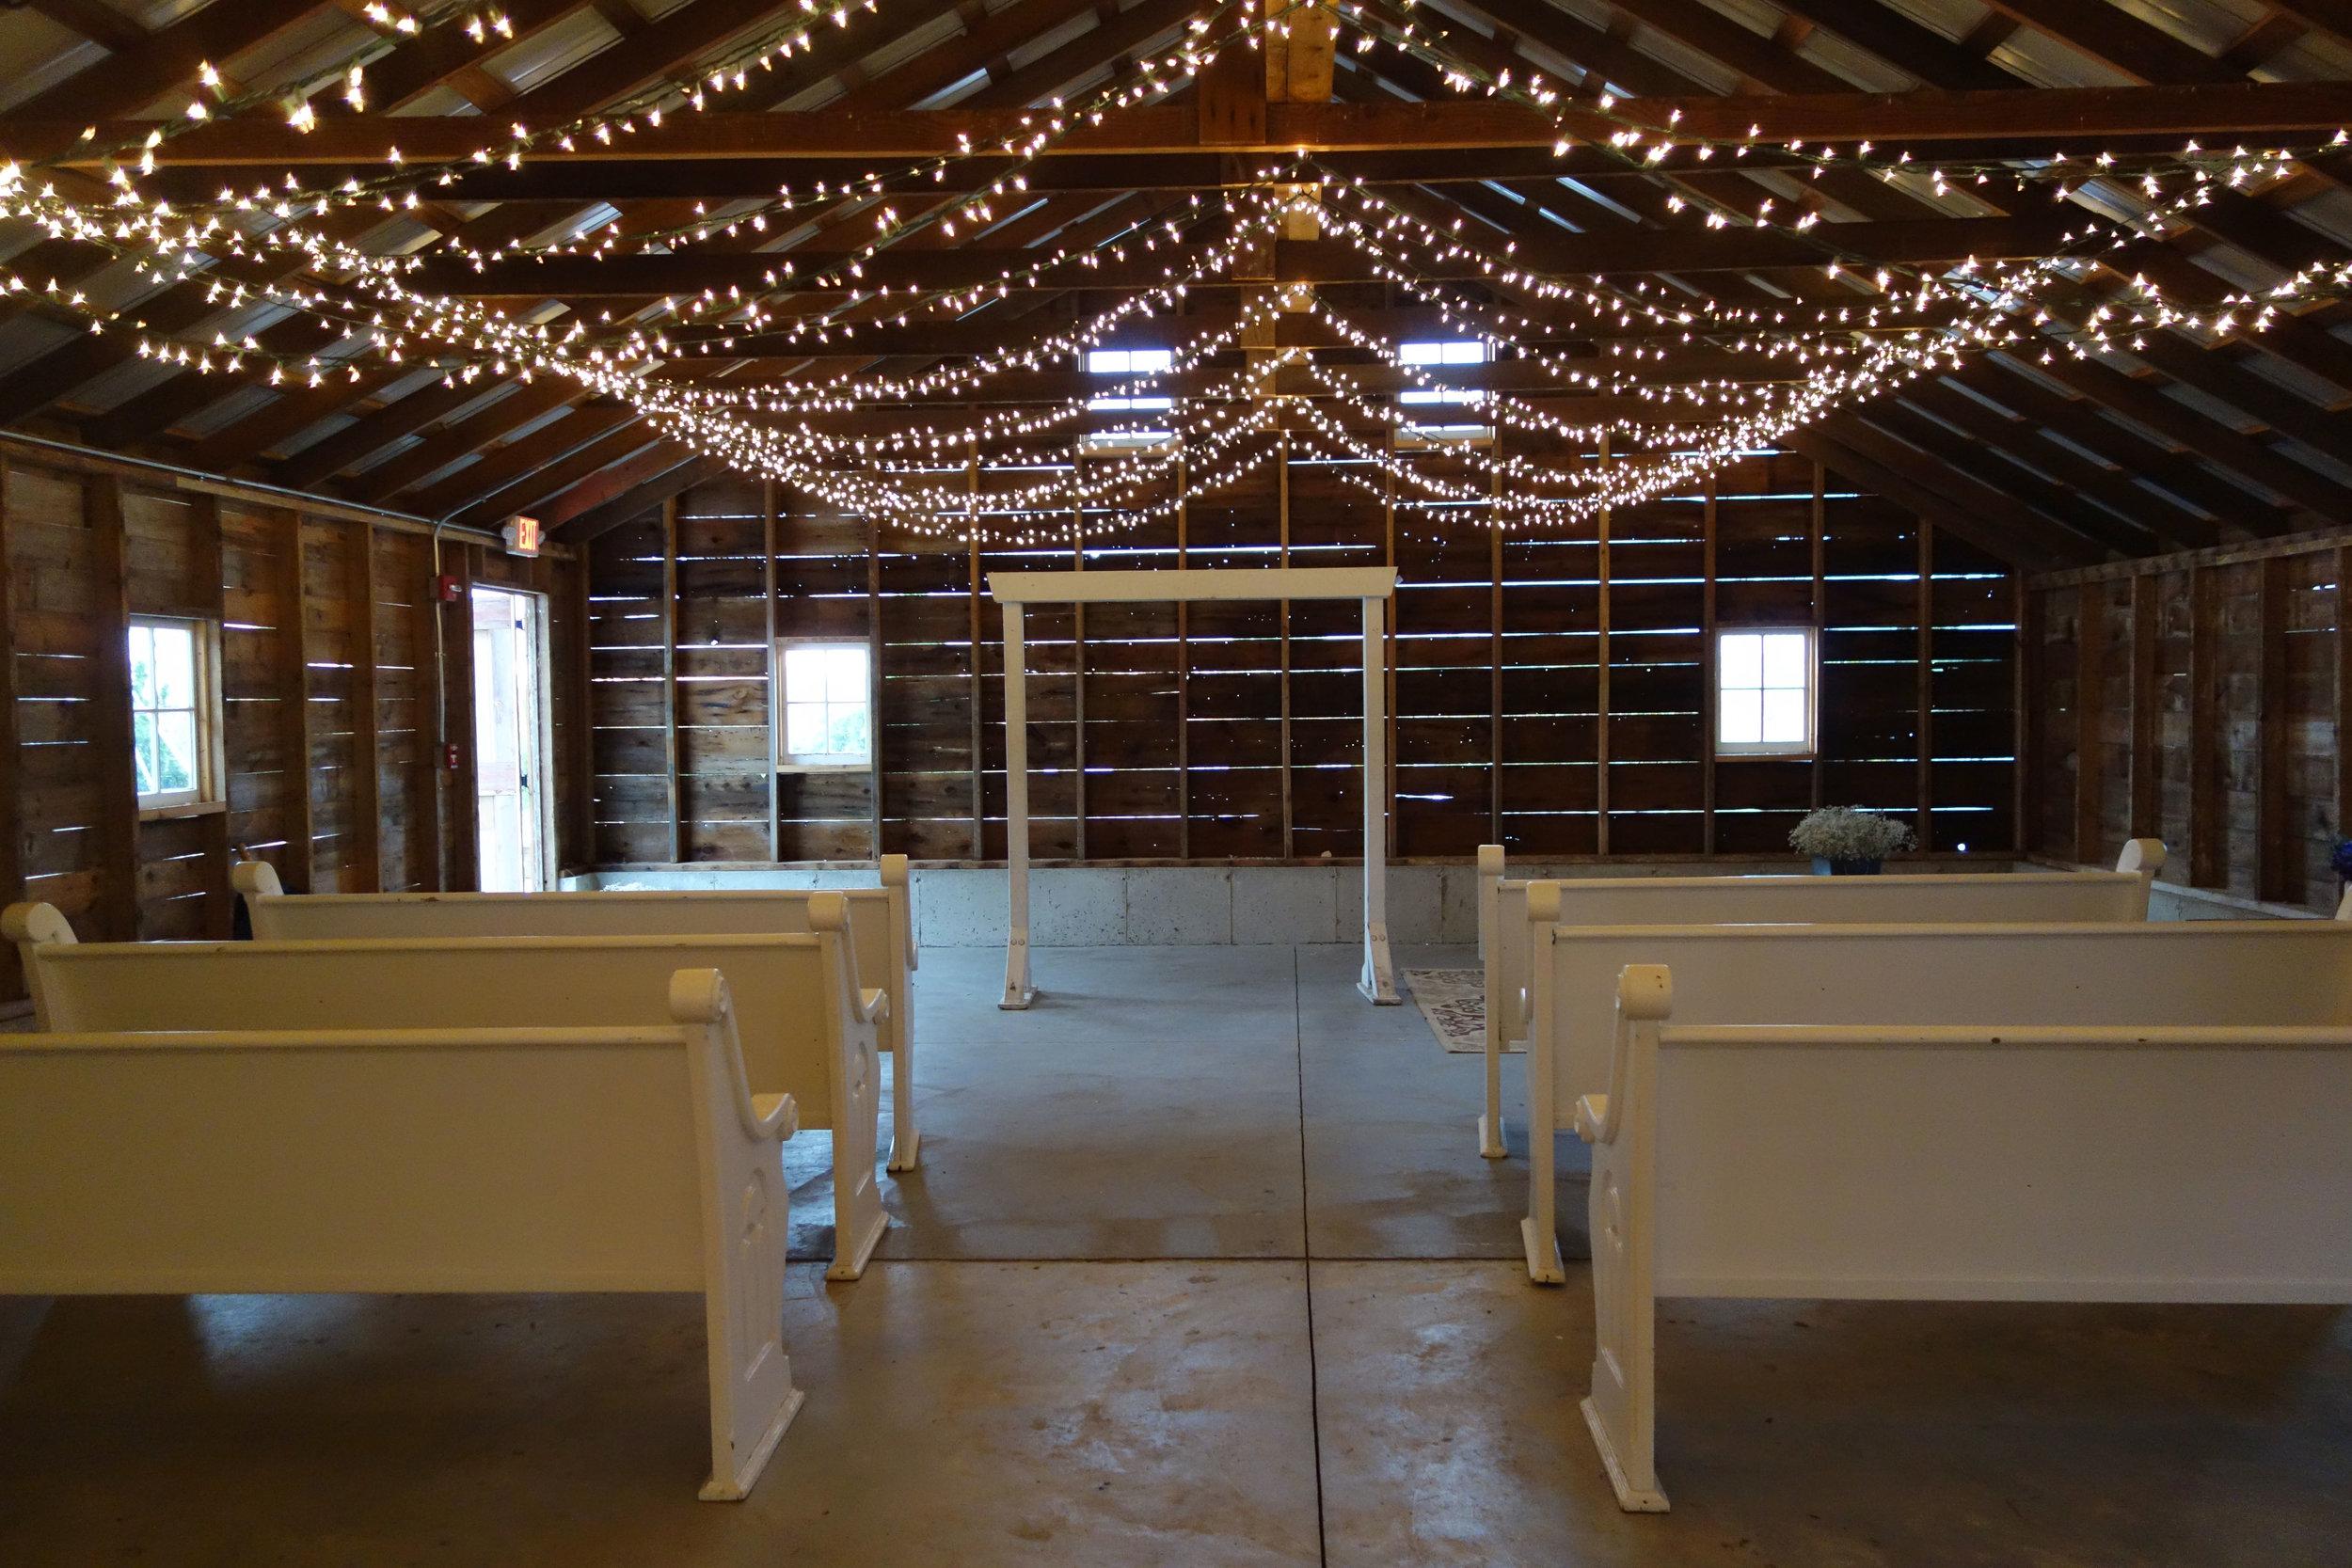 Quaint little barn!